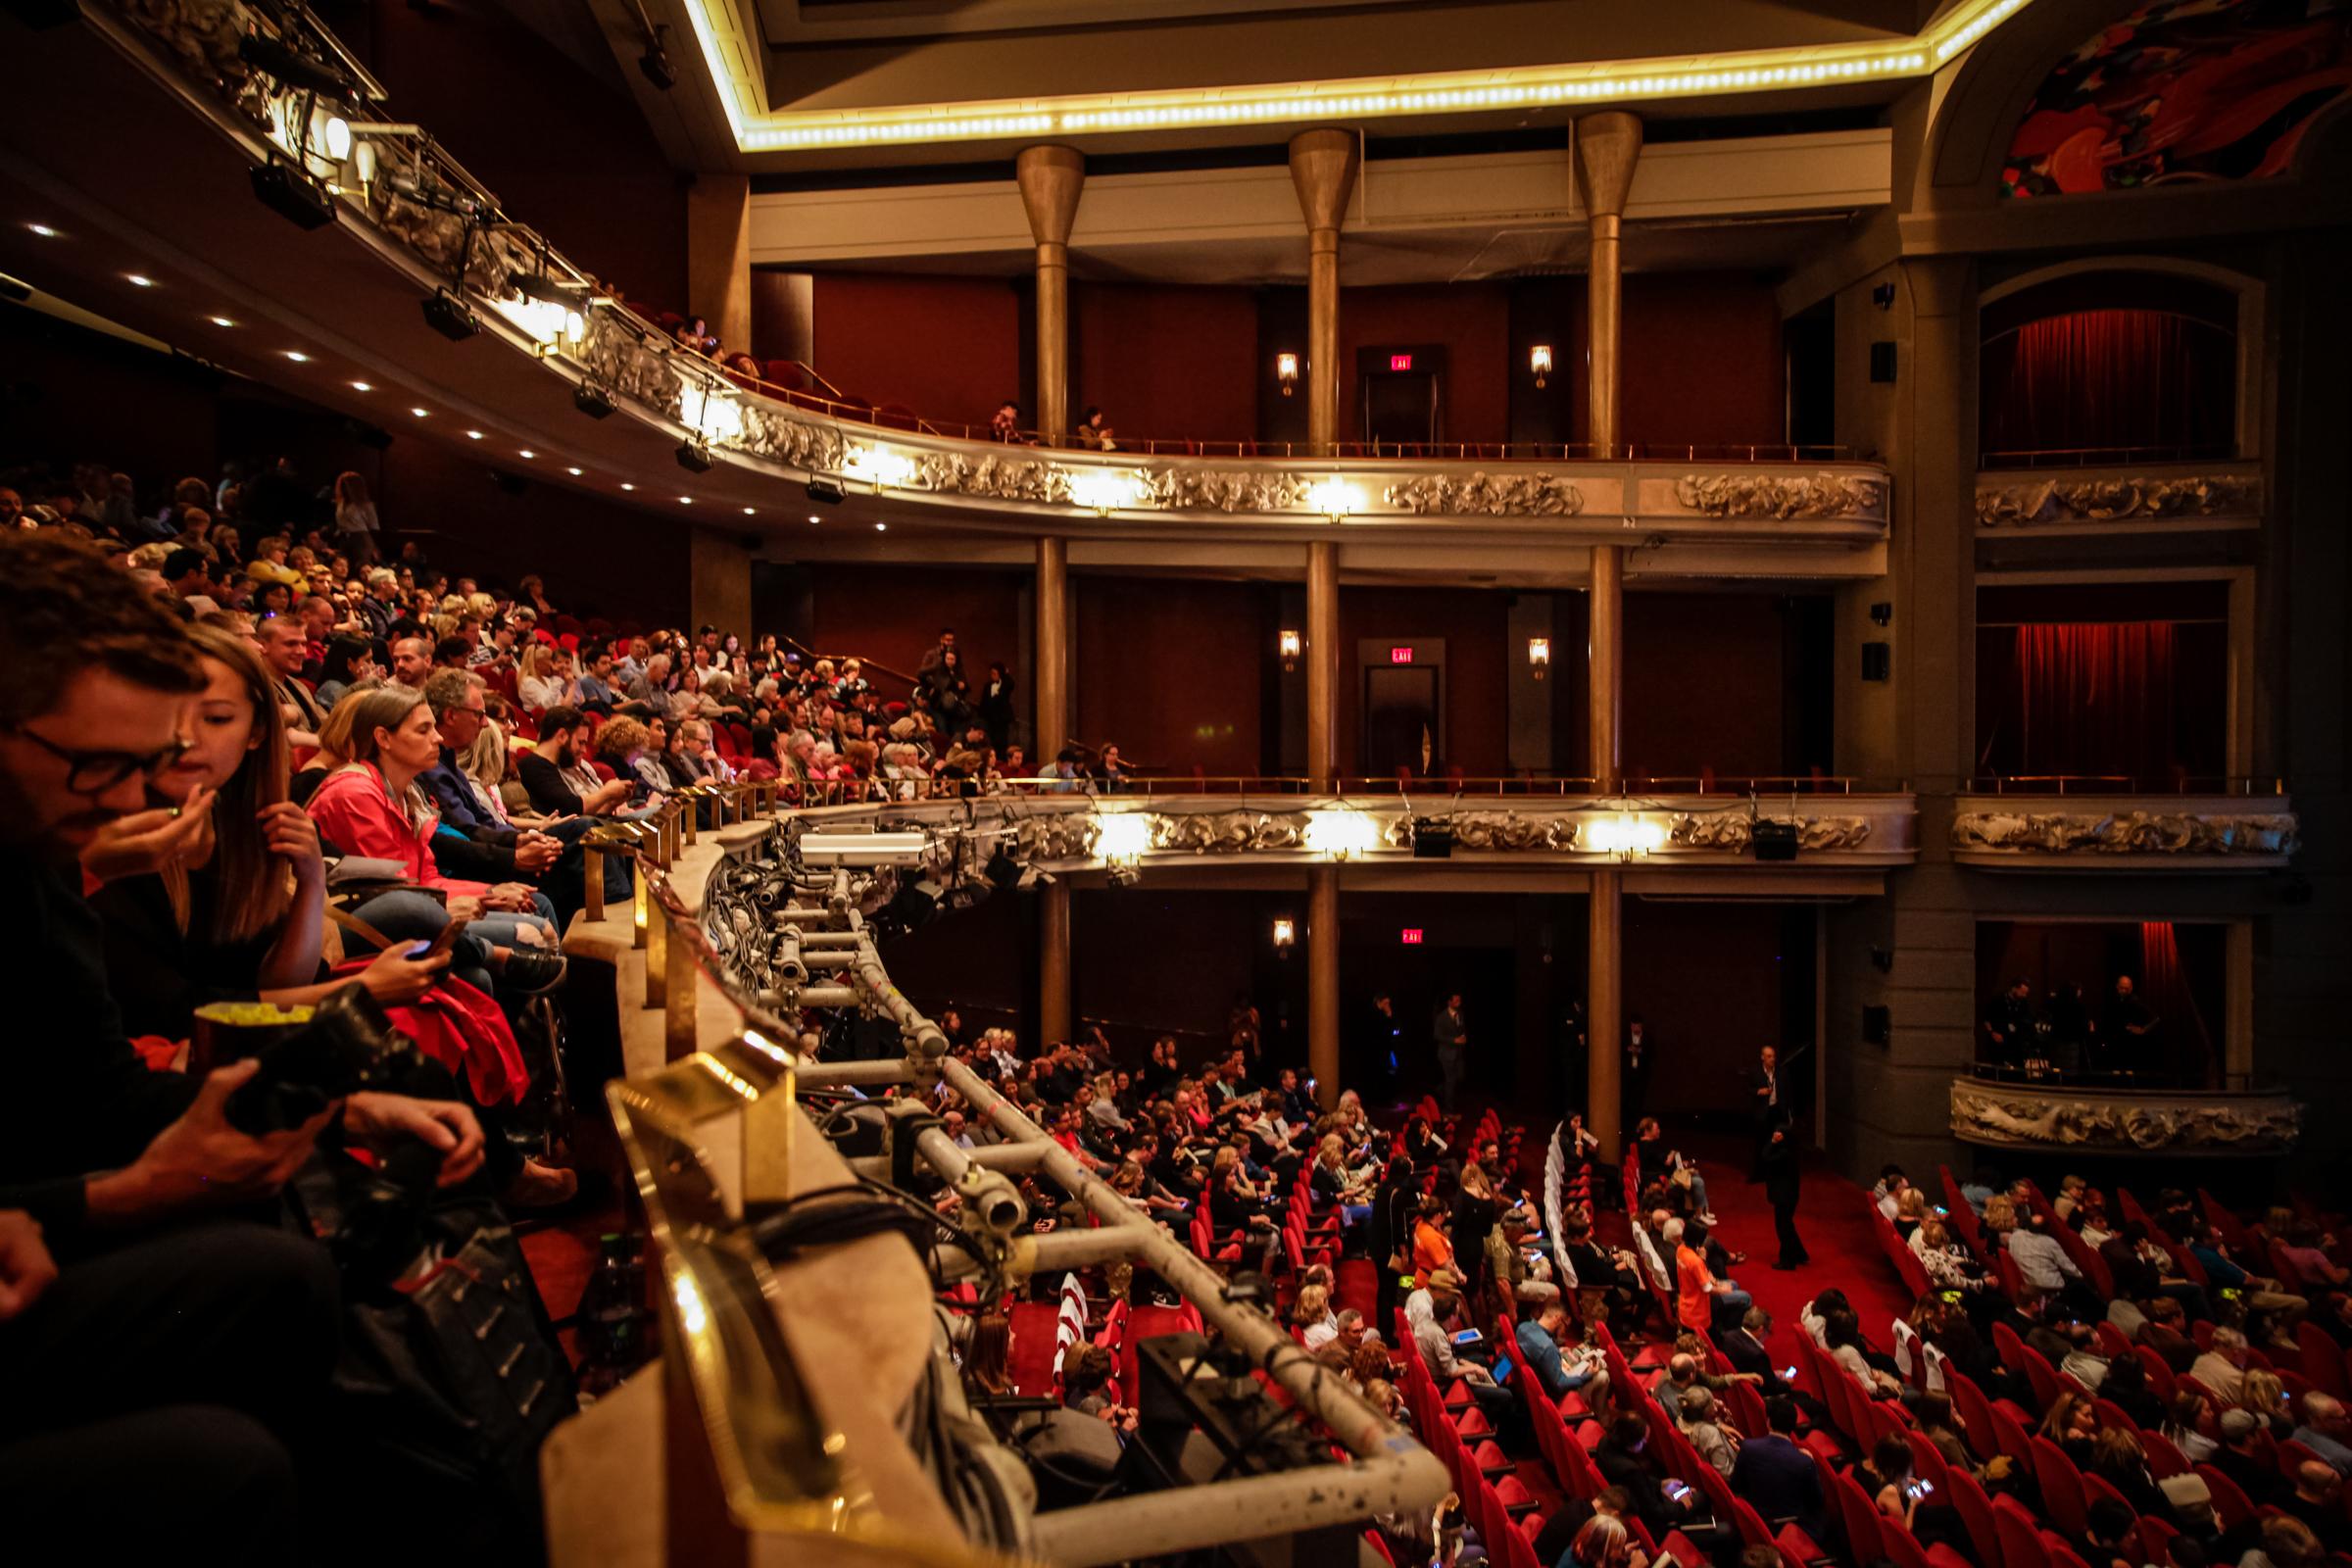 Toronto International Film Festival with canada goose